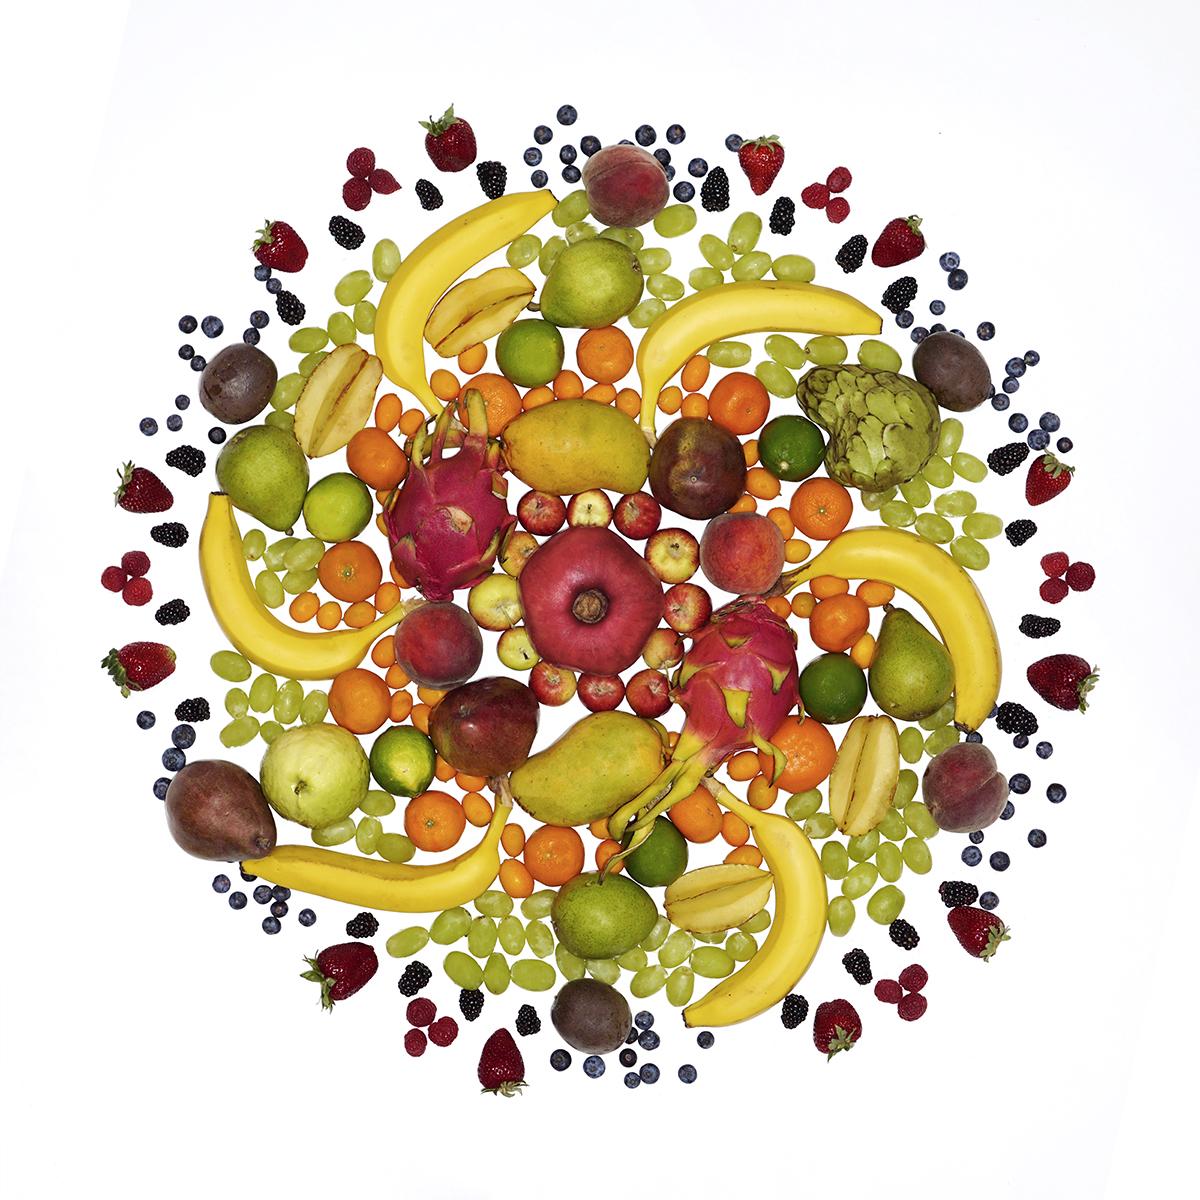 fruits_sm-2.jpg